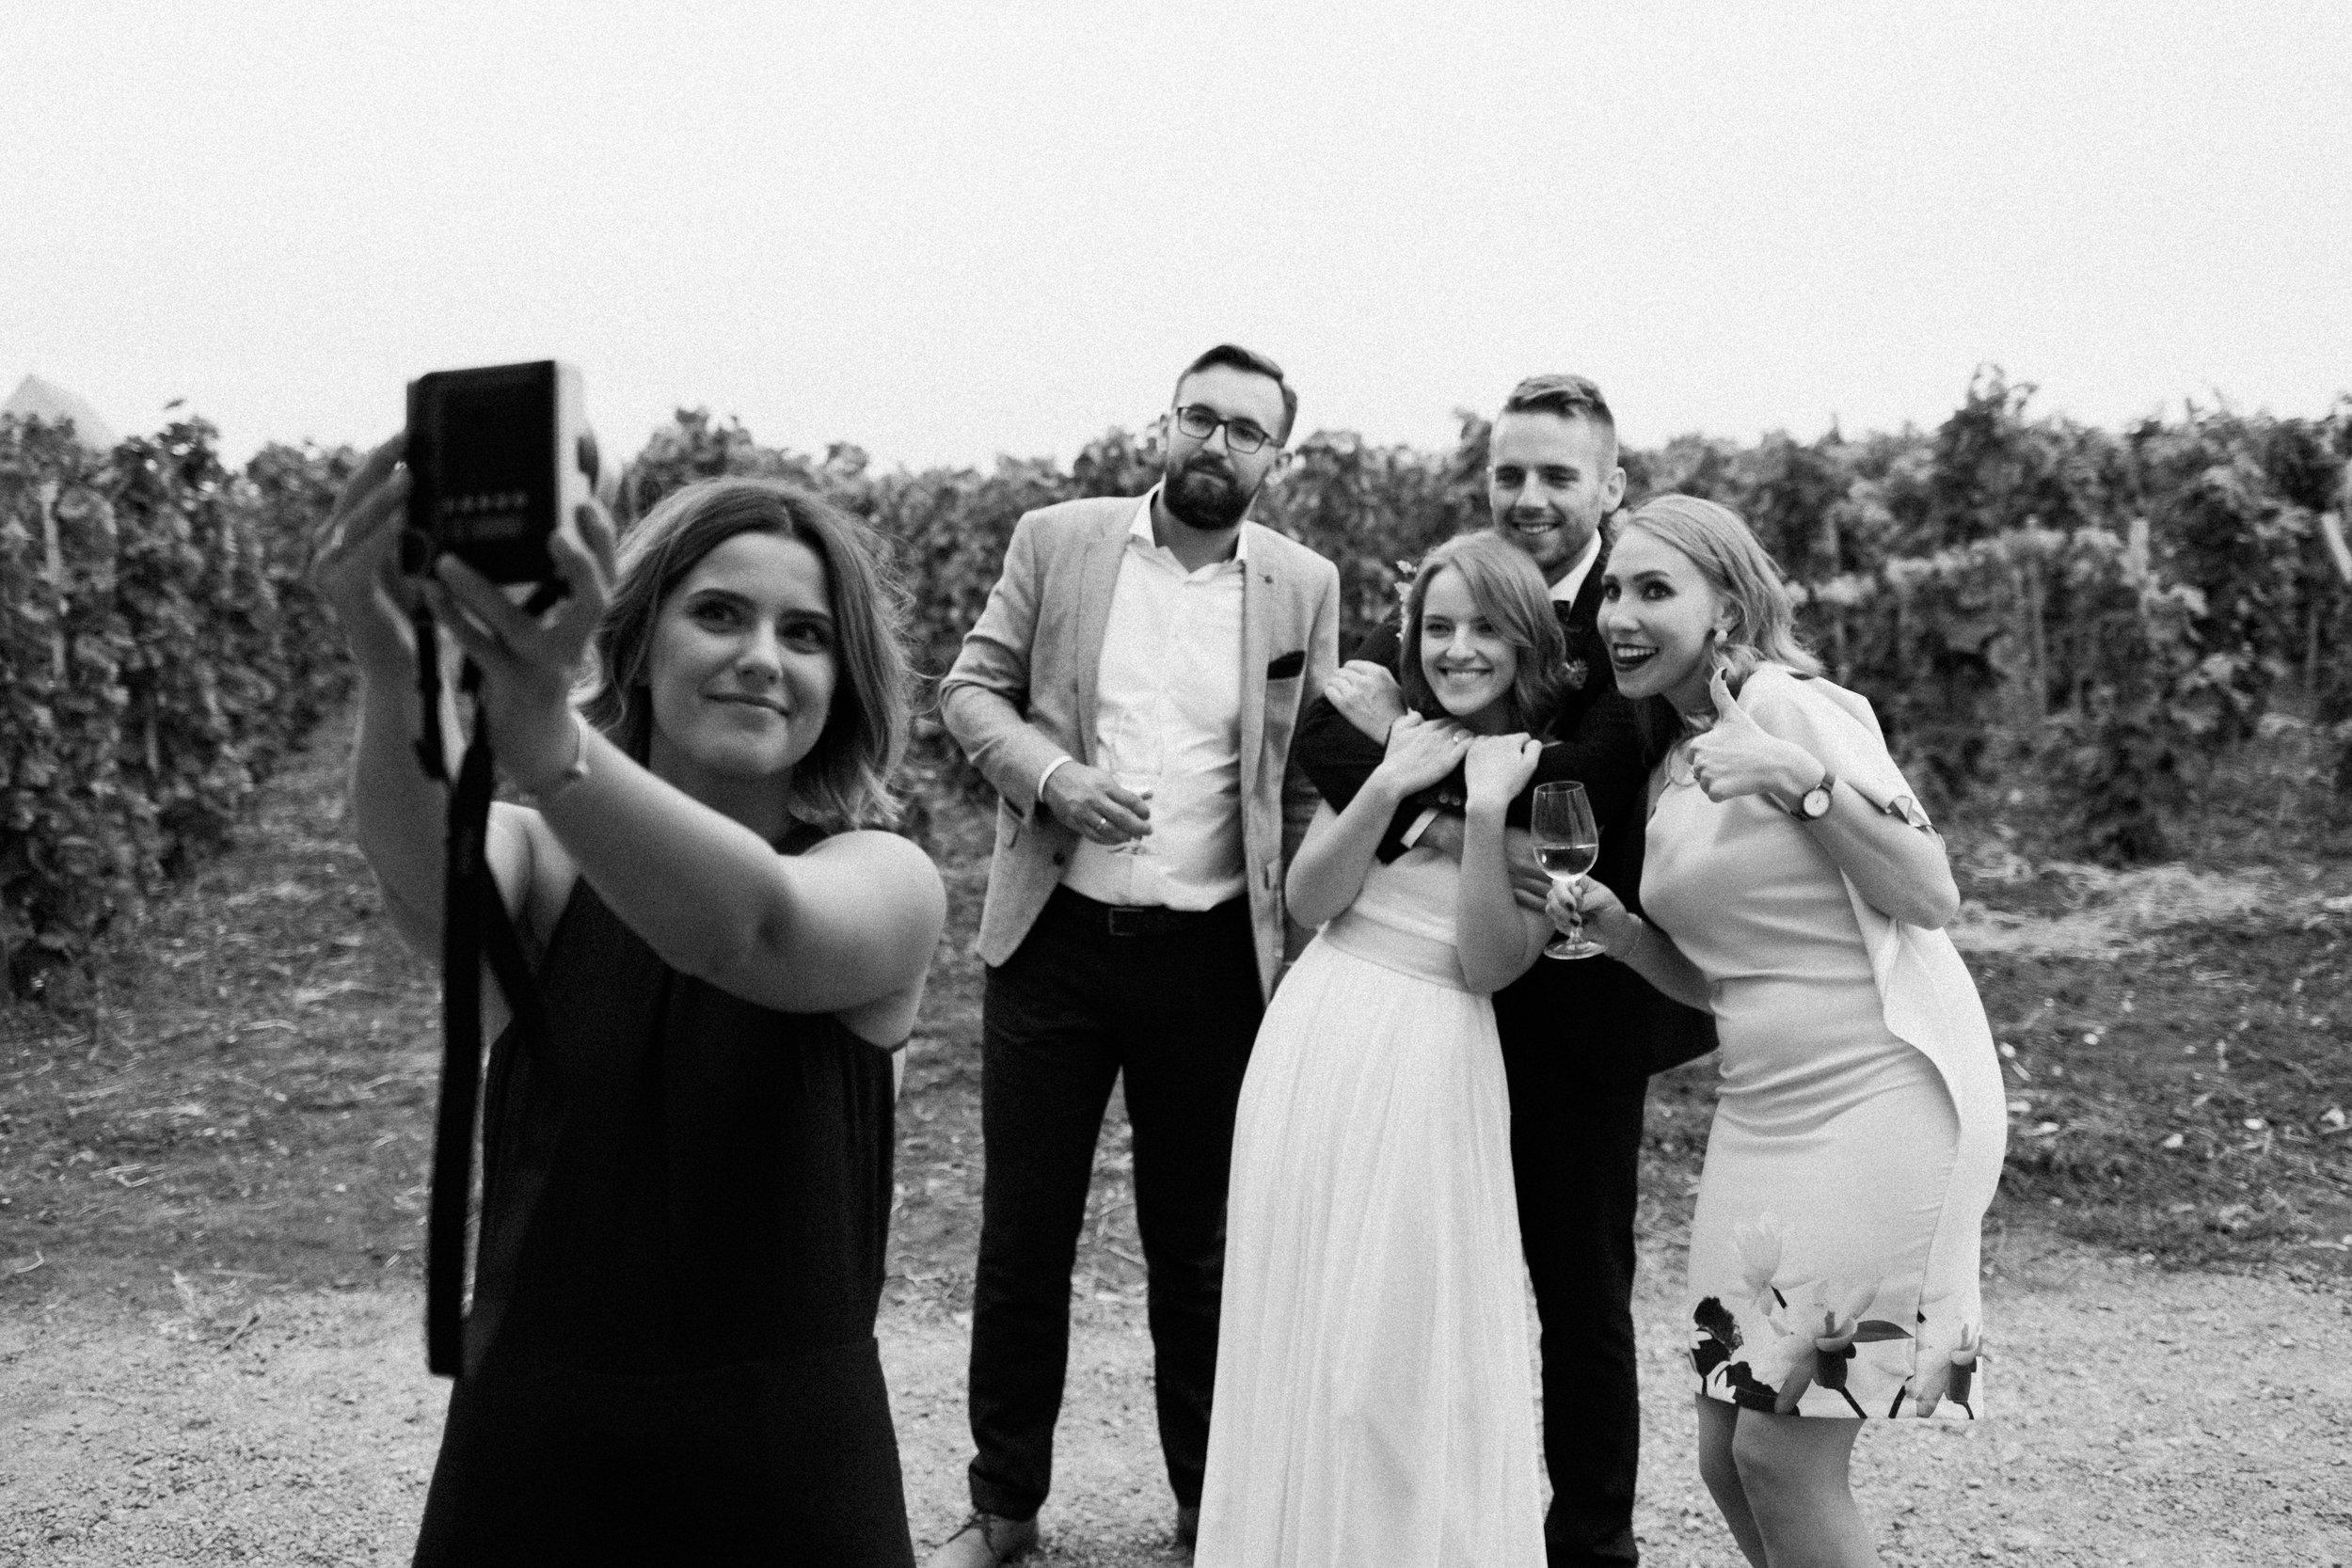 20170902_Monika+Marci_wedding_f_585__MG_6081_1.jpg